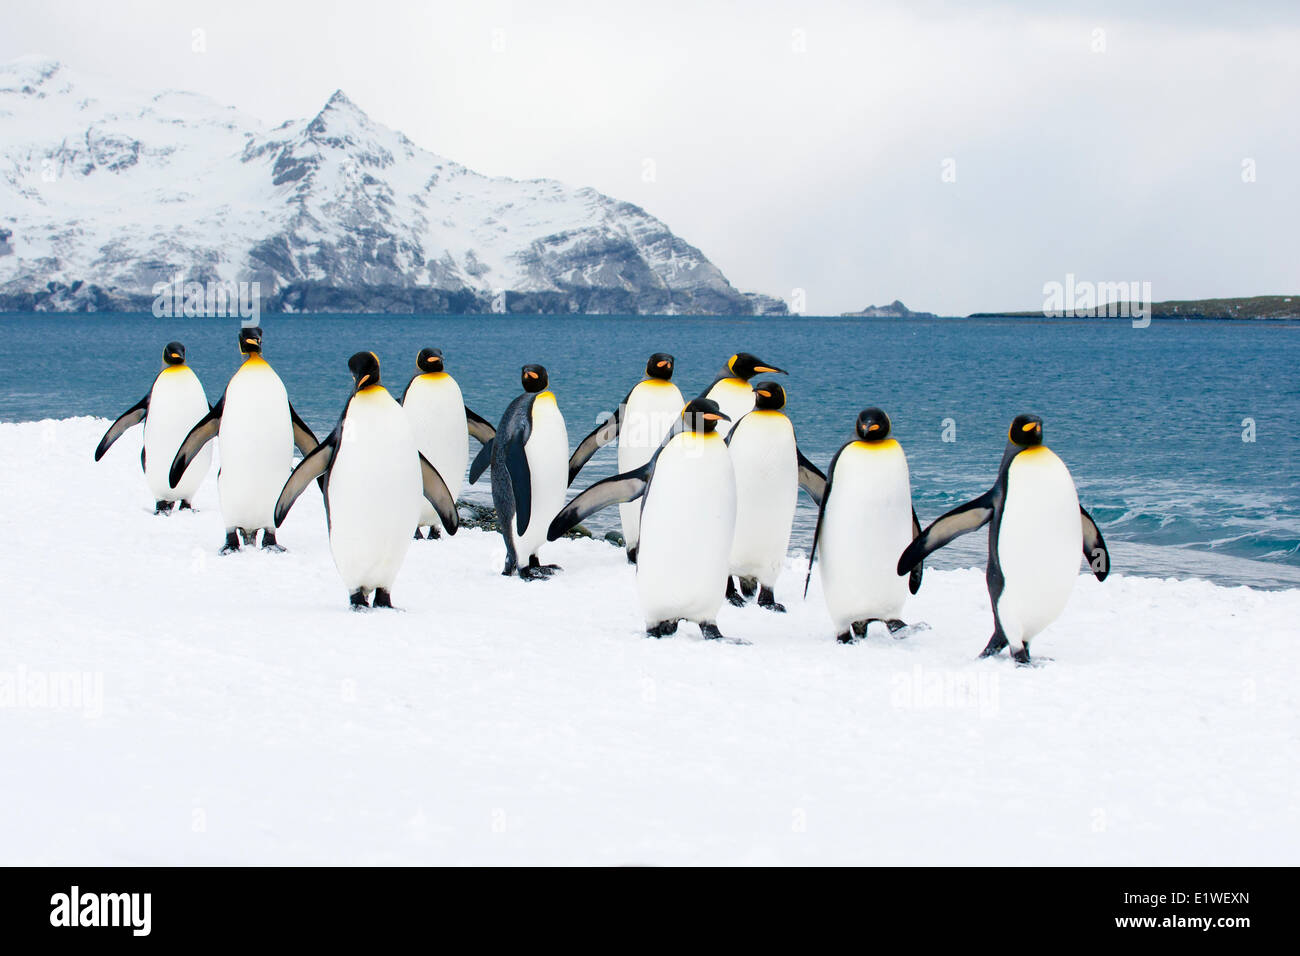 King penguins (Aptenodytes patagonicus) loafing on the beach, Island of South Georgia, Antarctica Stock Photo